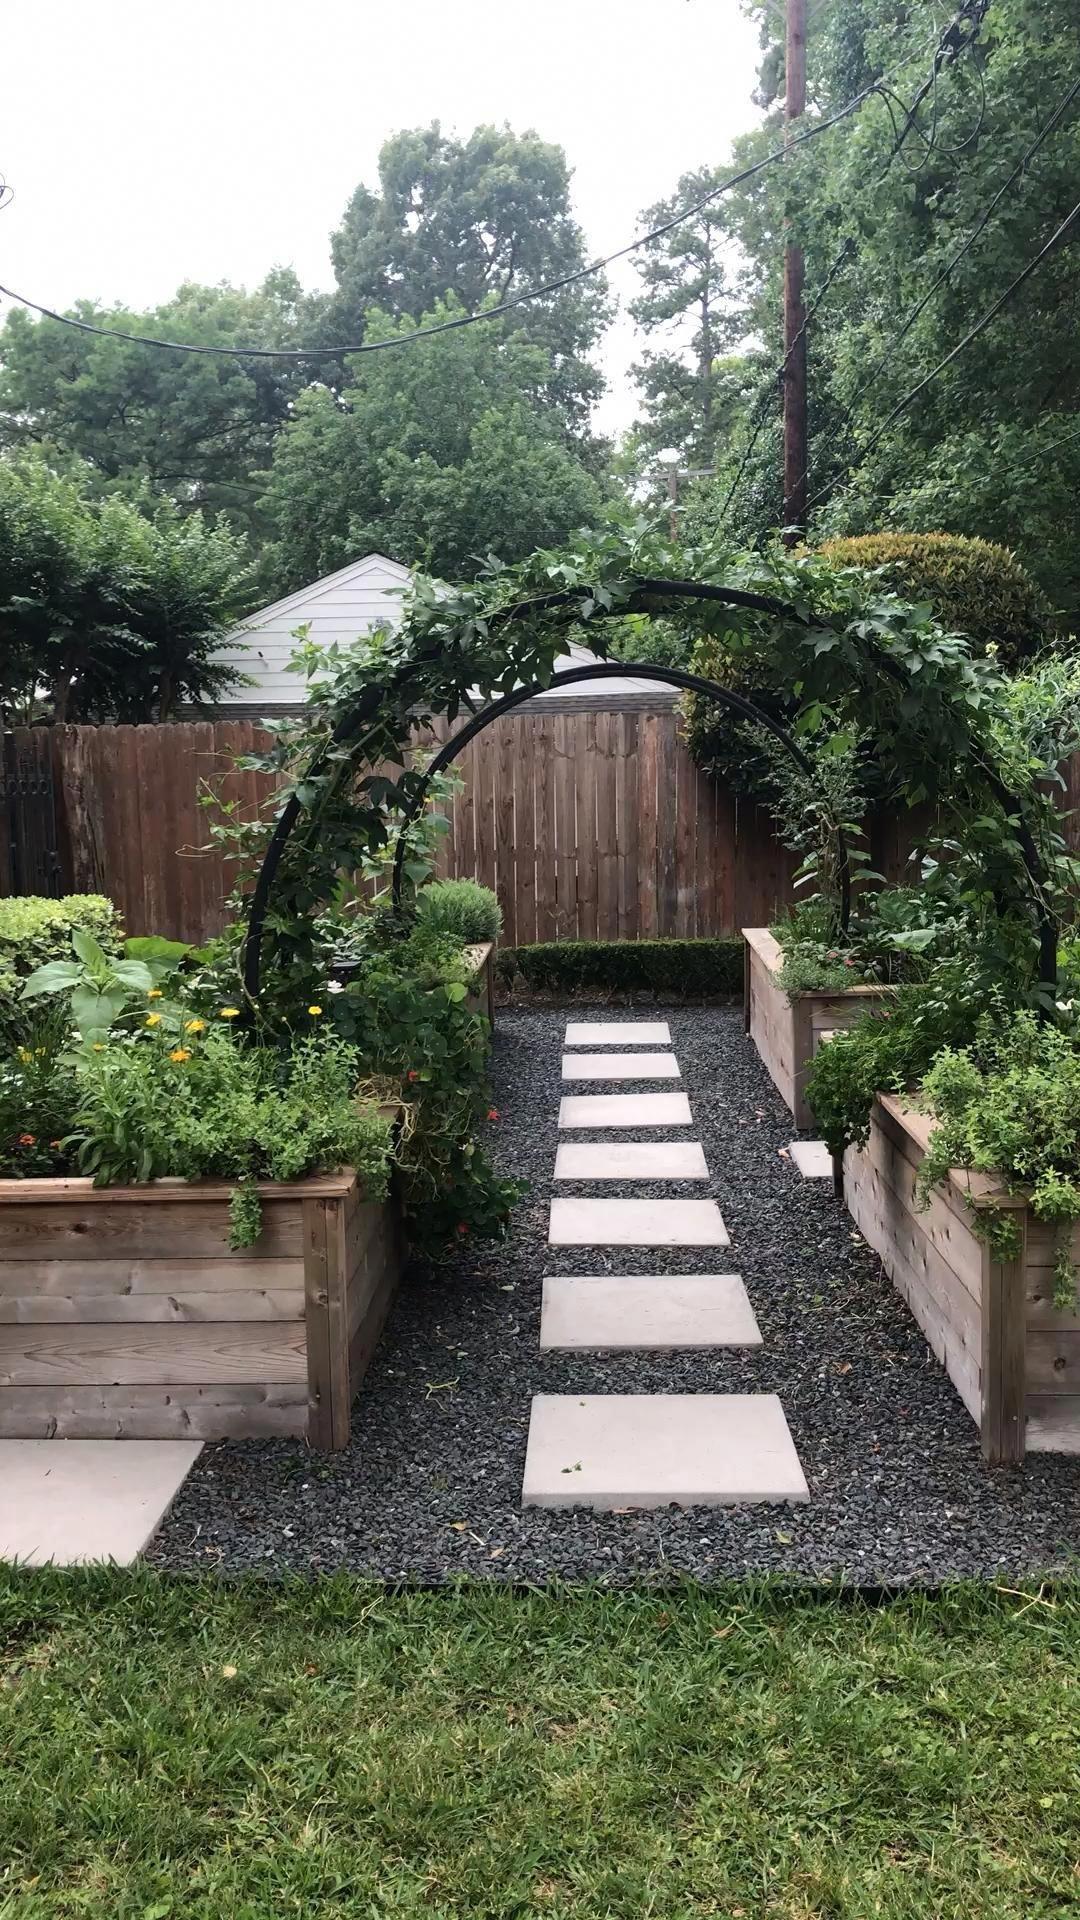 Backyard Landscaping Cost In 2020 Garden Design Backyard Garden Design Modern Garden Landscaping